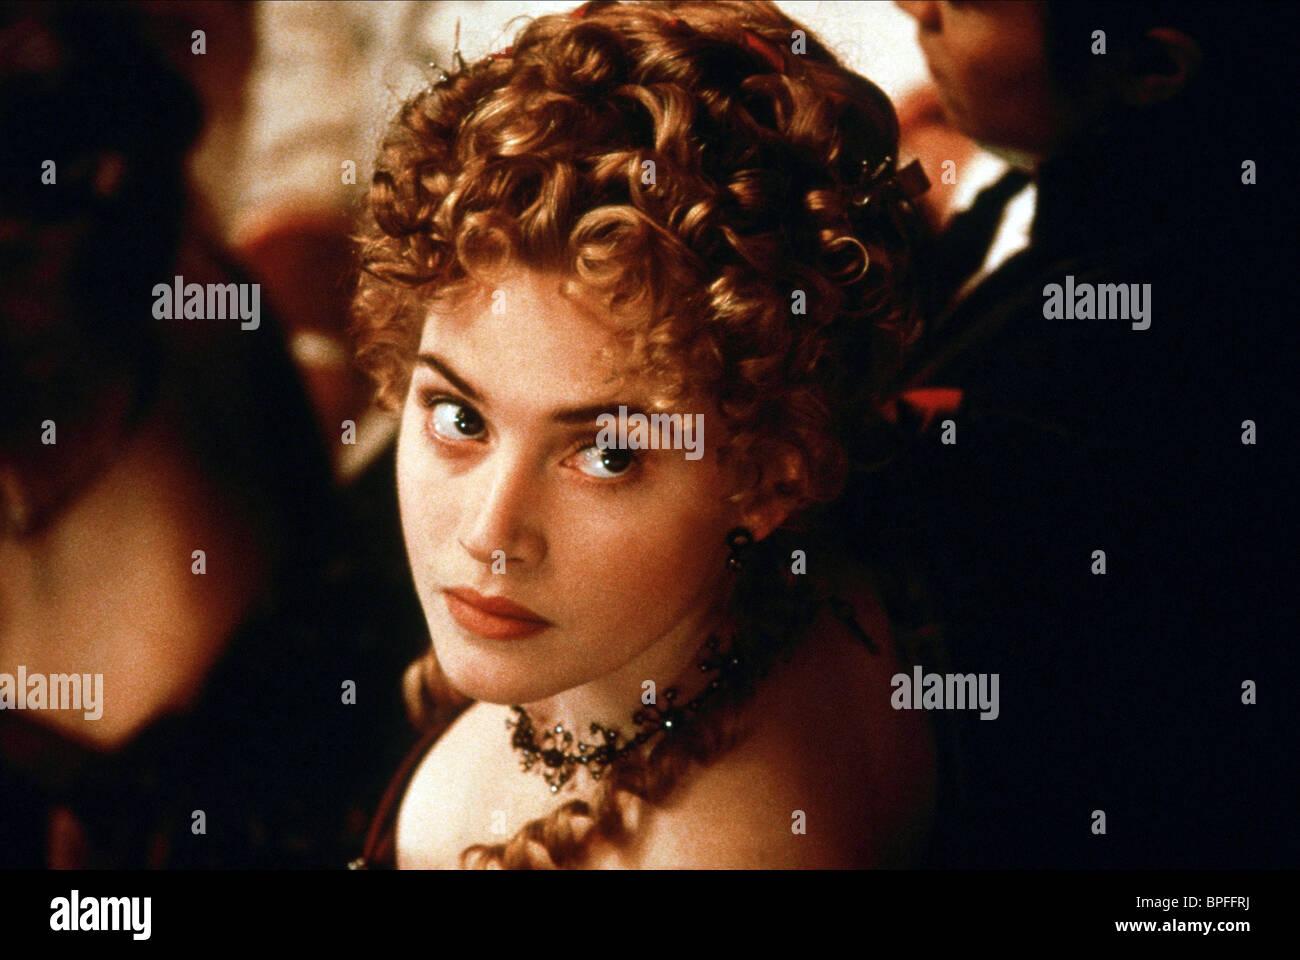 KATE WINSLET HAMLET (1996) - Stock Image